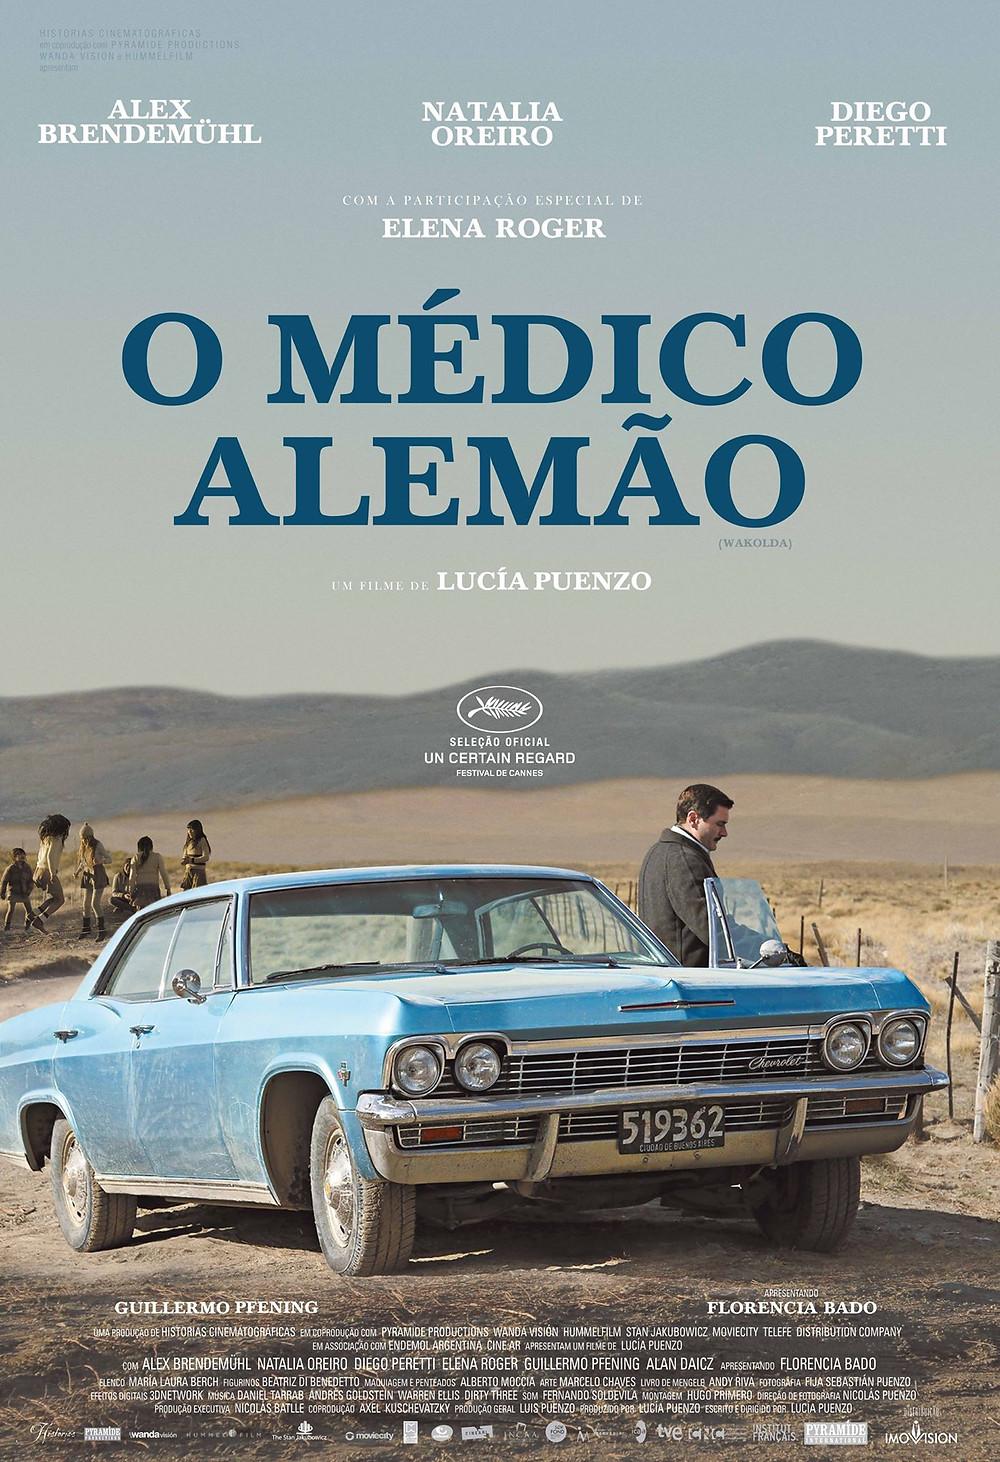 Médico Alemão (Wakolda: 2013)